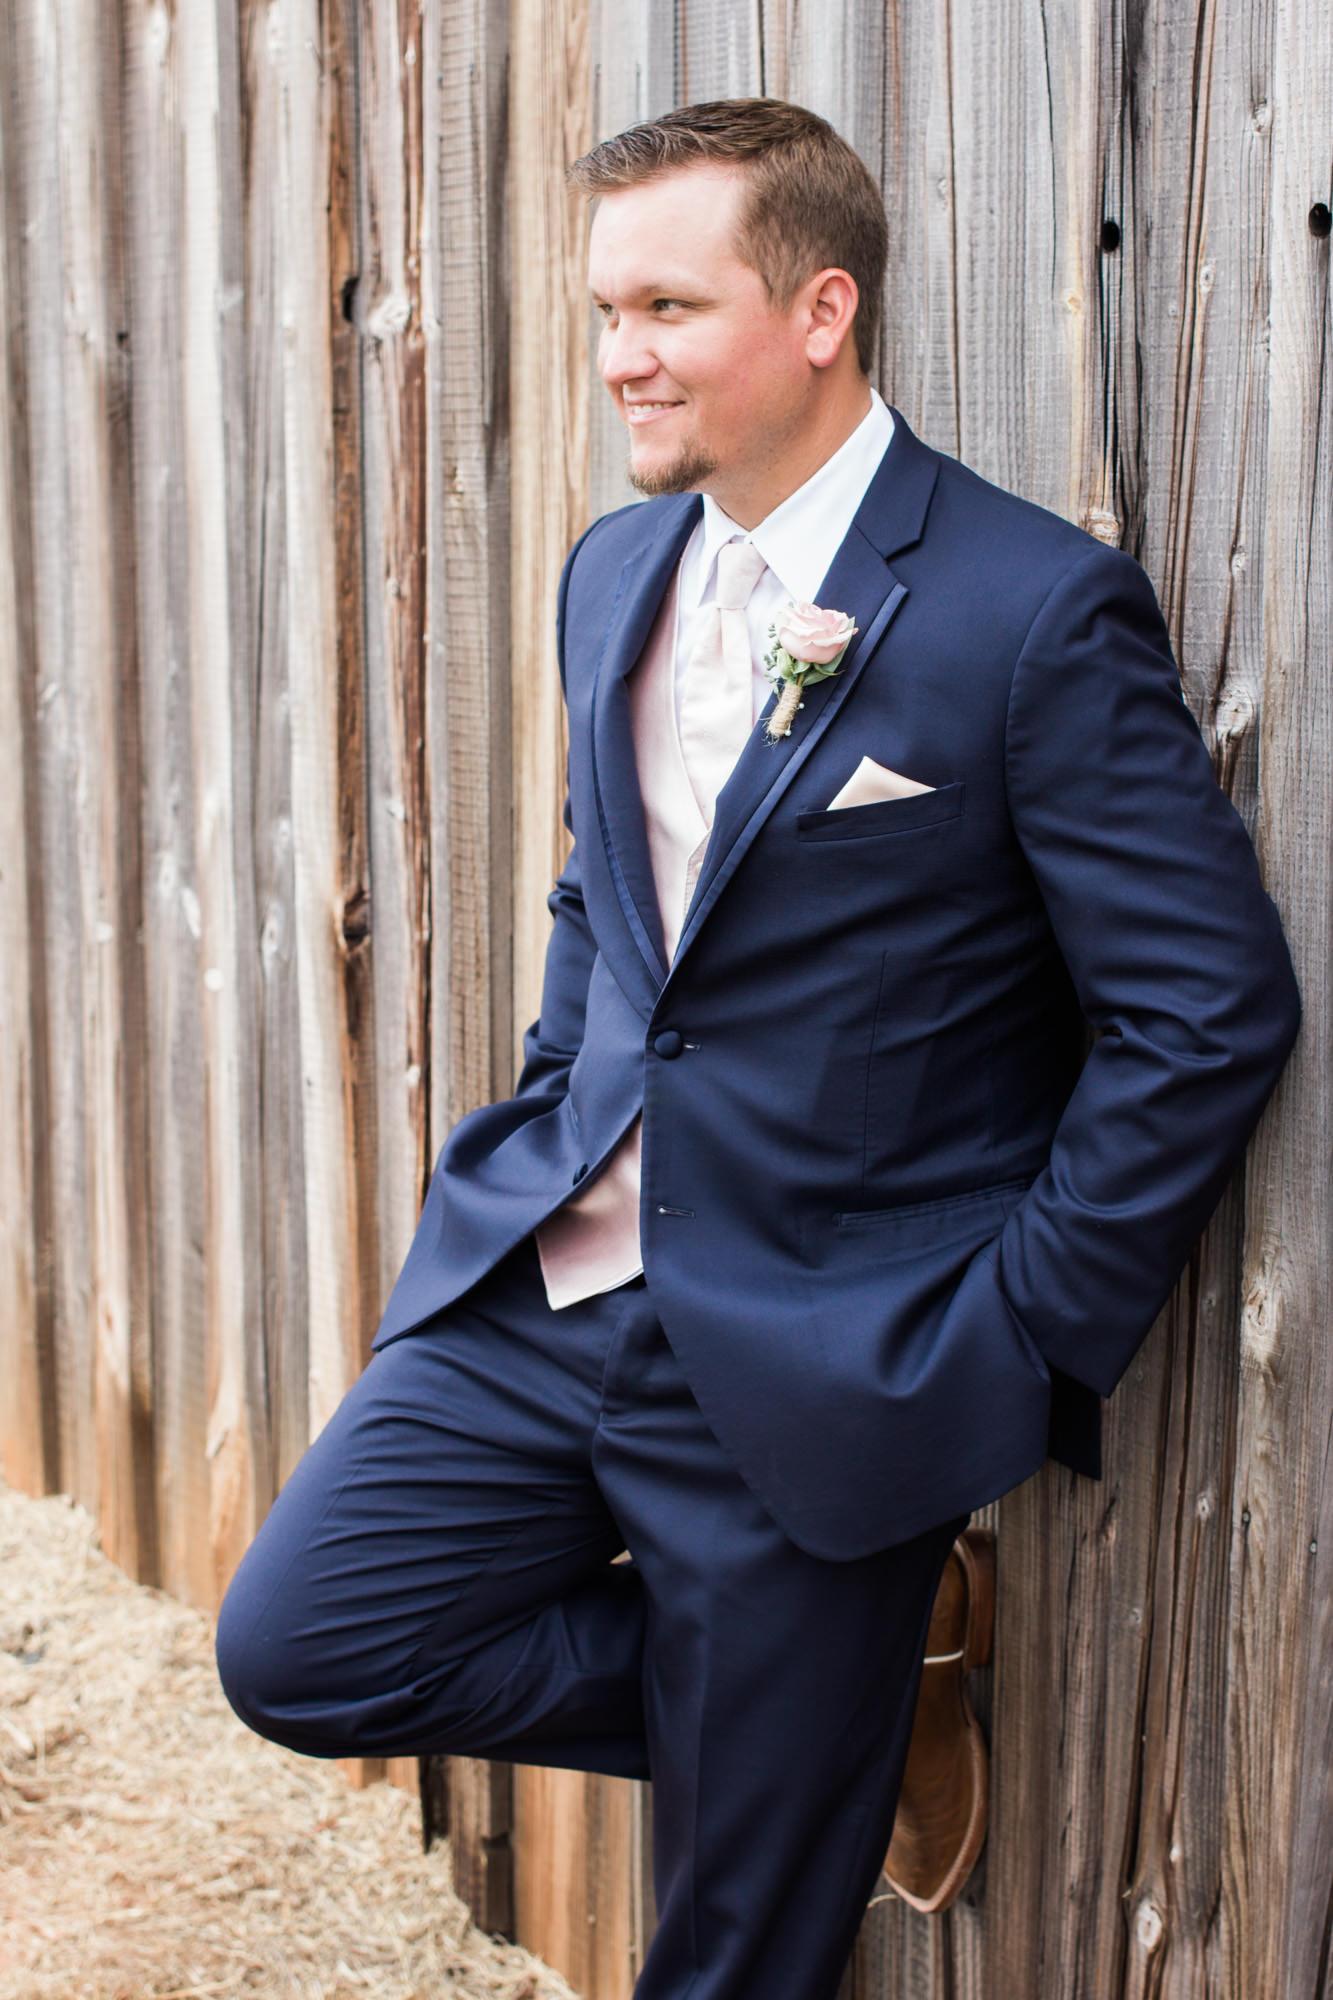 georiga-wedding-groom-14.jpg